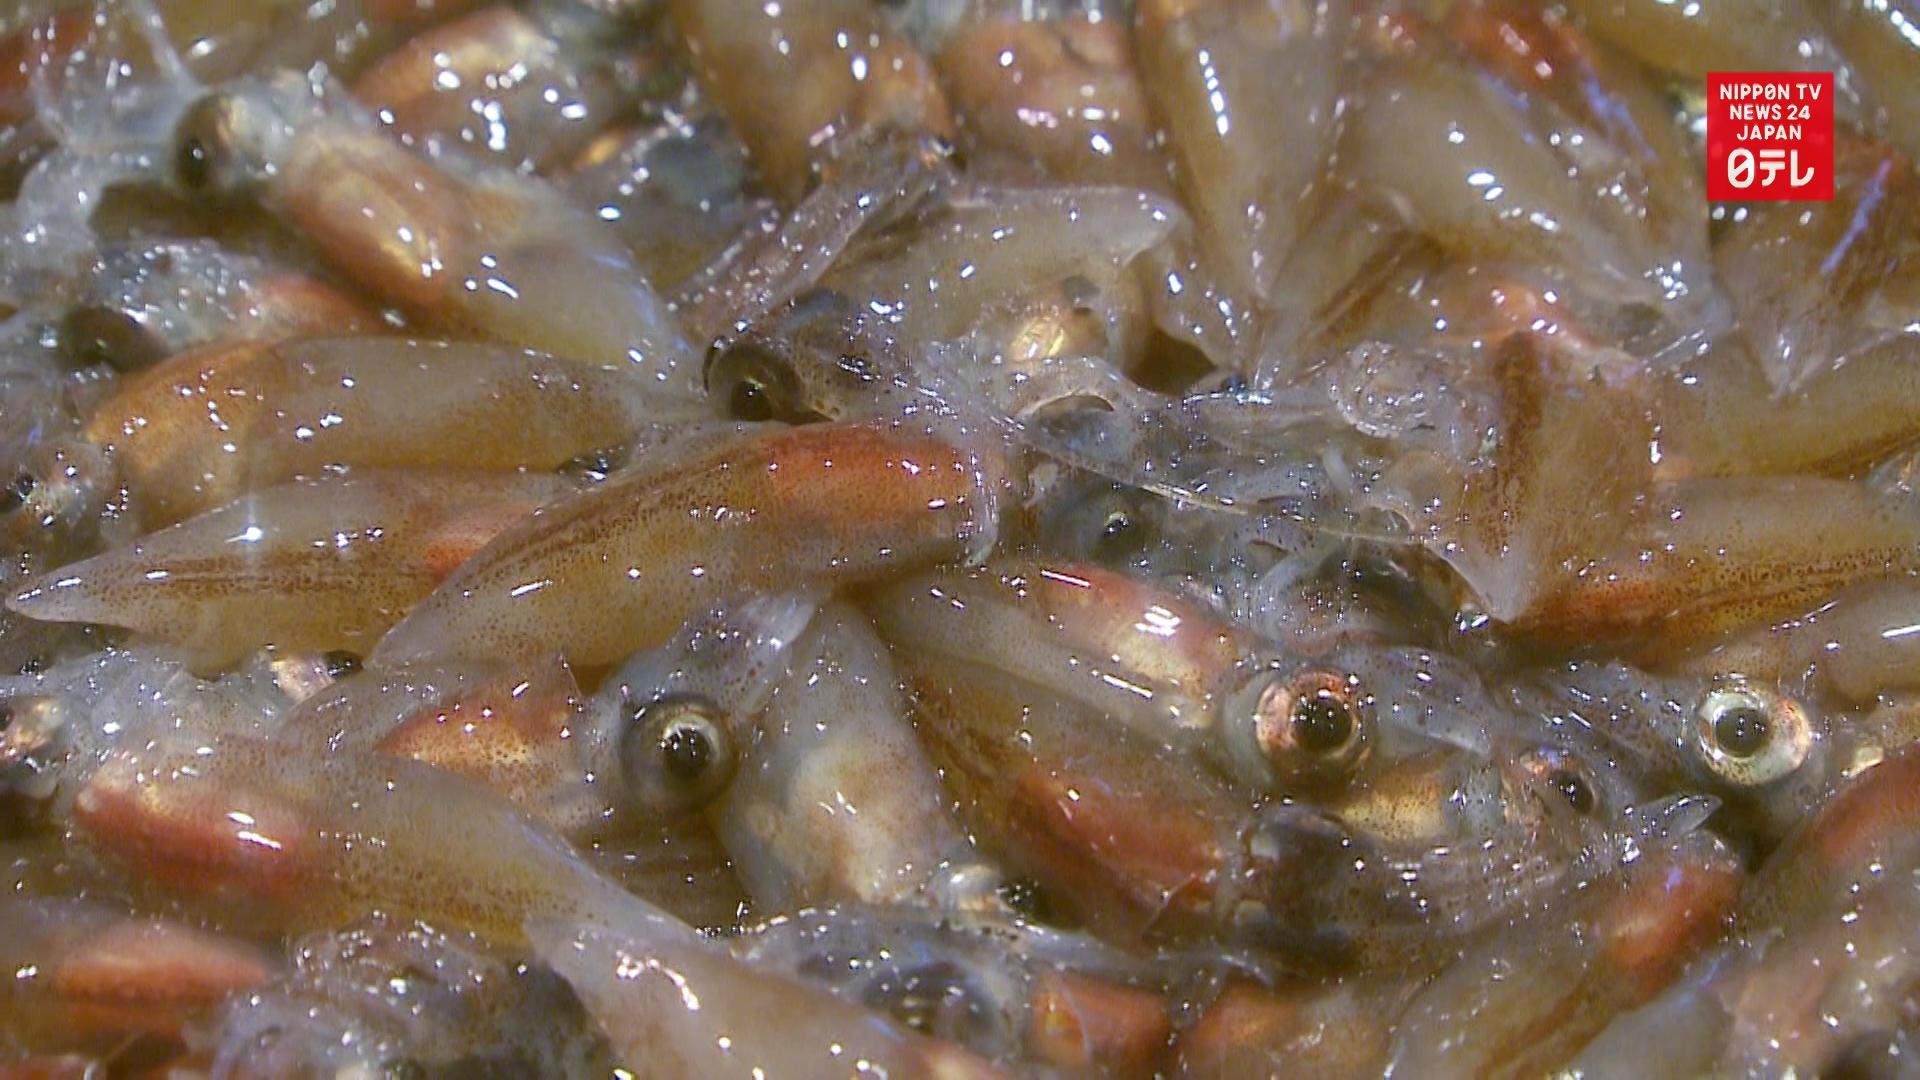 Firefly squid haul on Toyama Bay